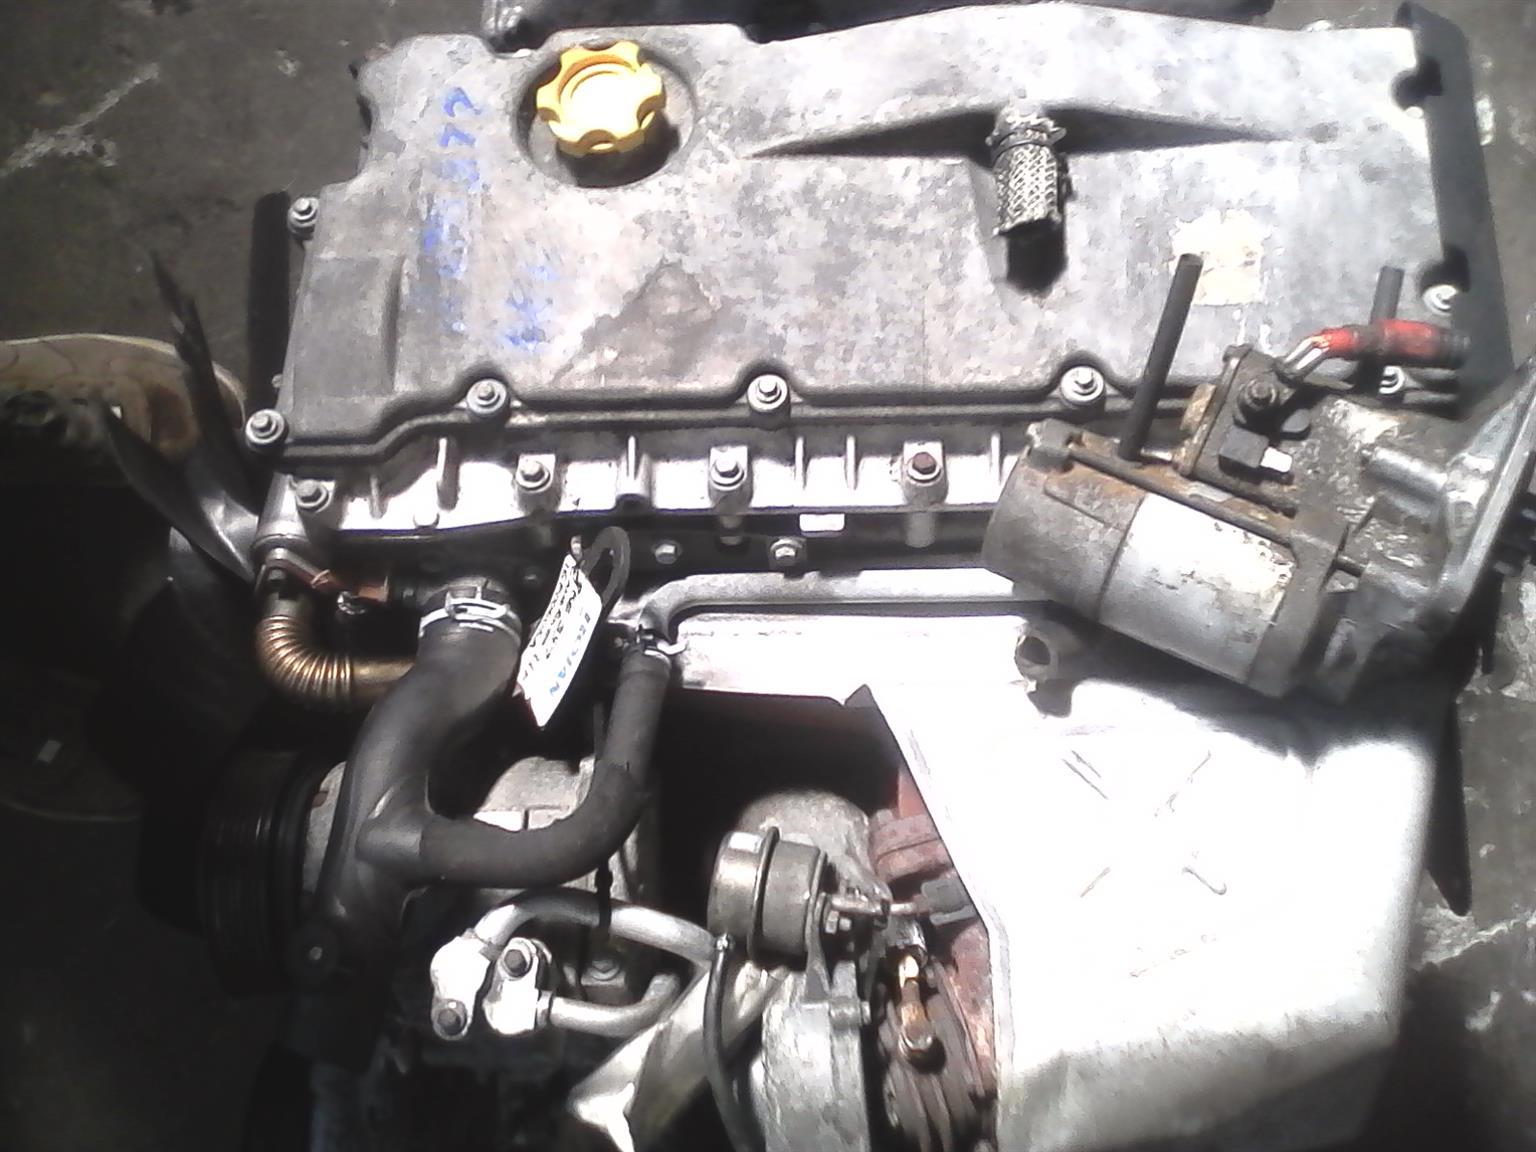 Land Rover 25tdi 12l 18l 21l Engine For Sale Junk Mail Hyundai 1 8l